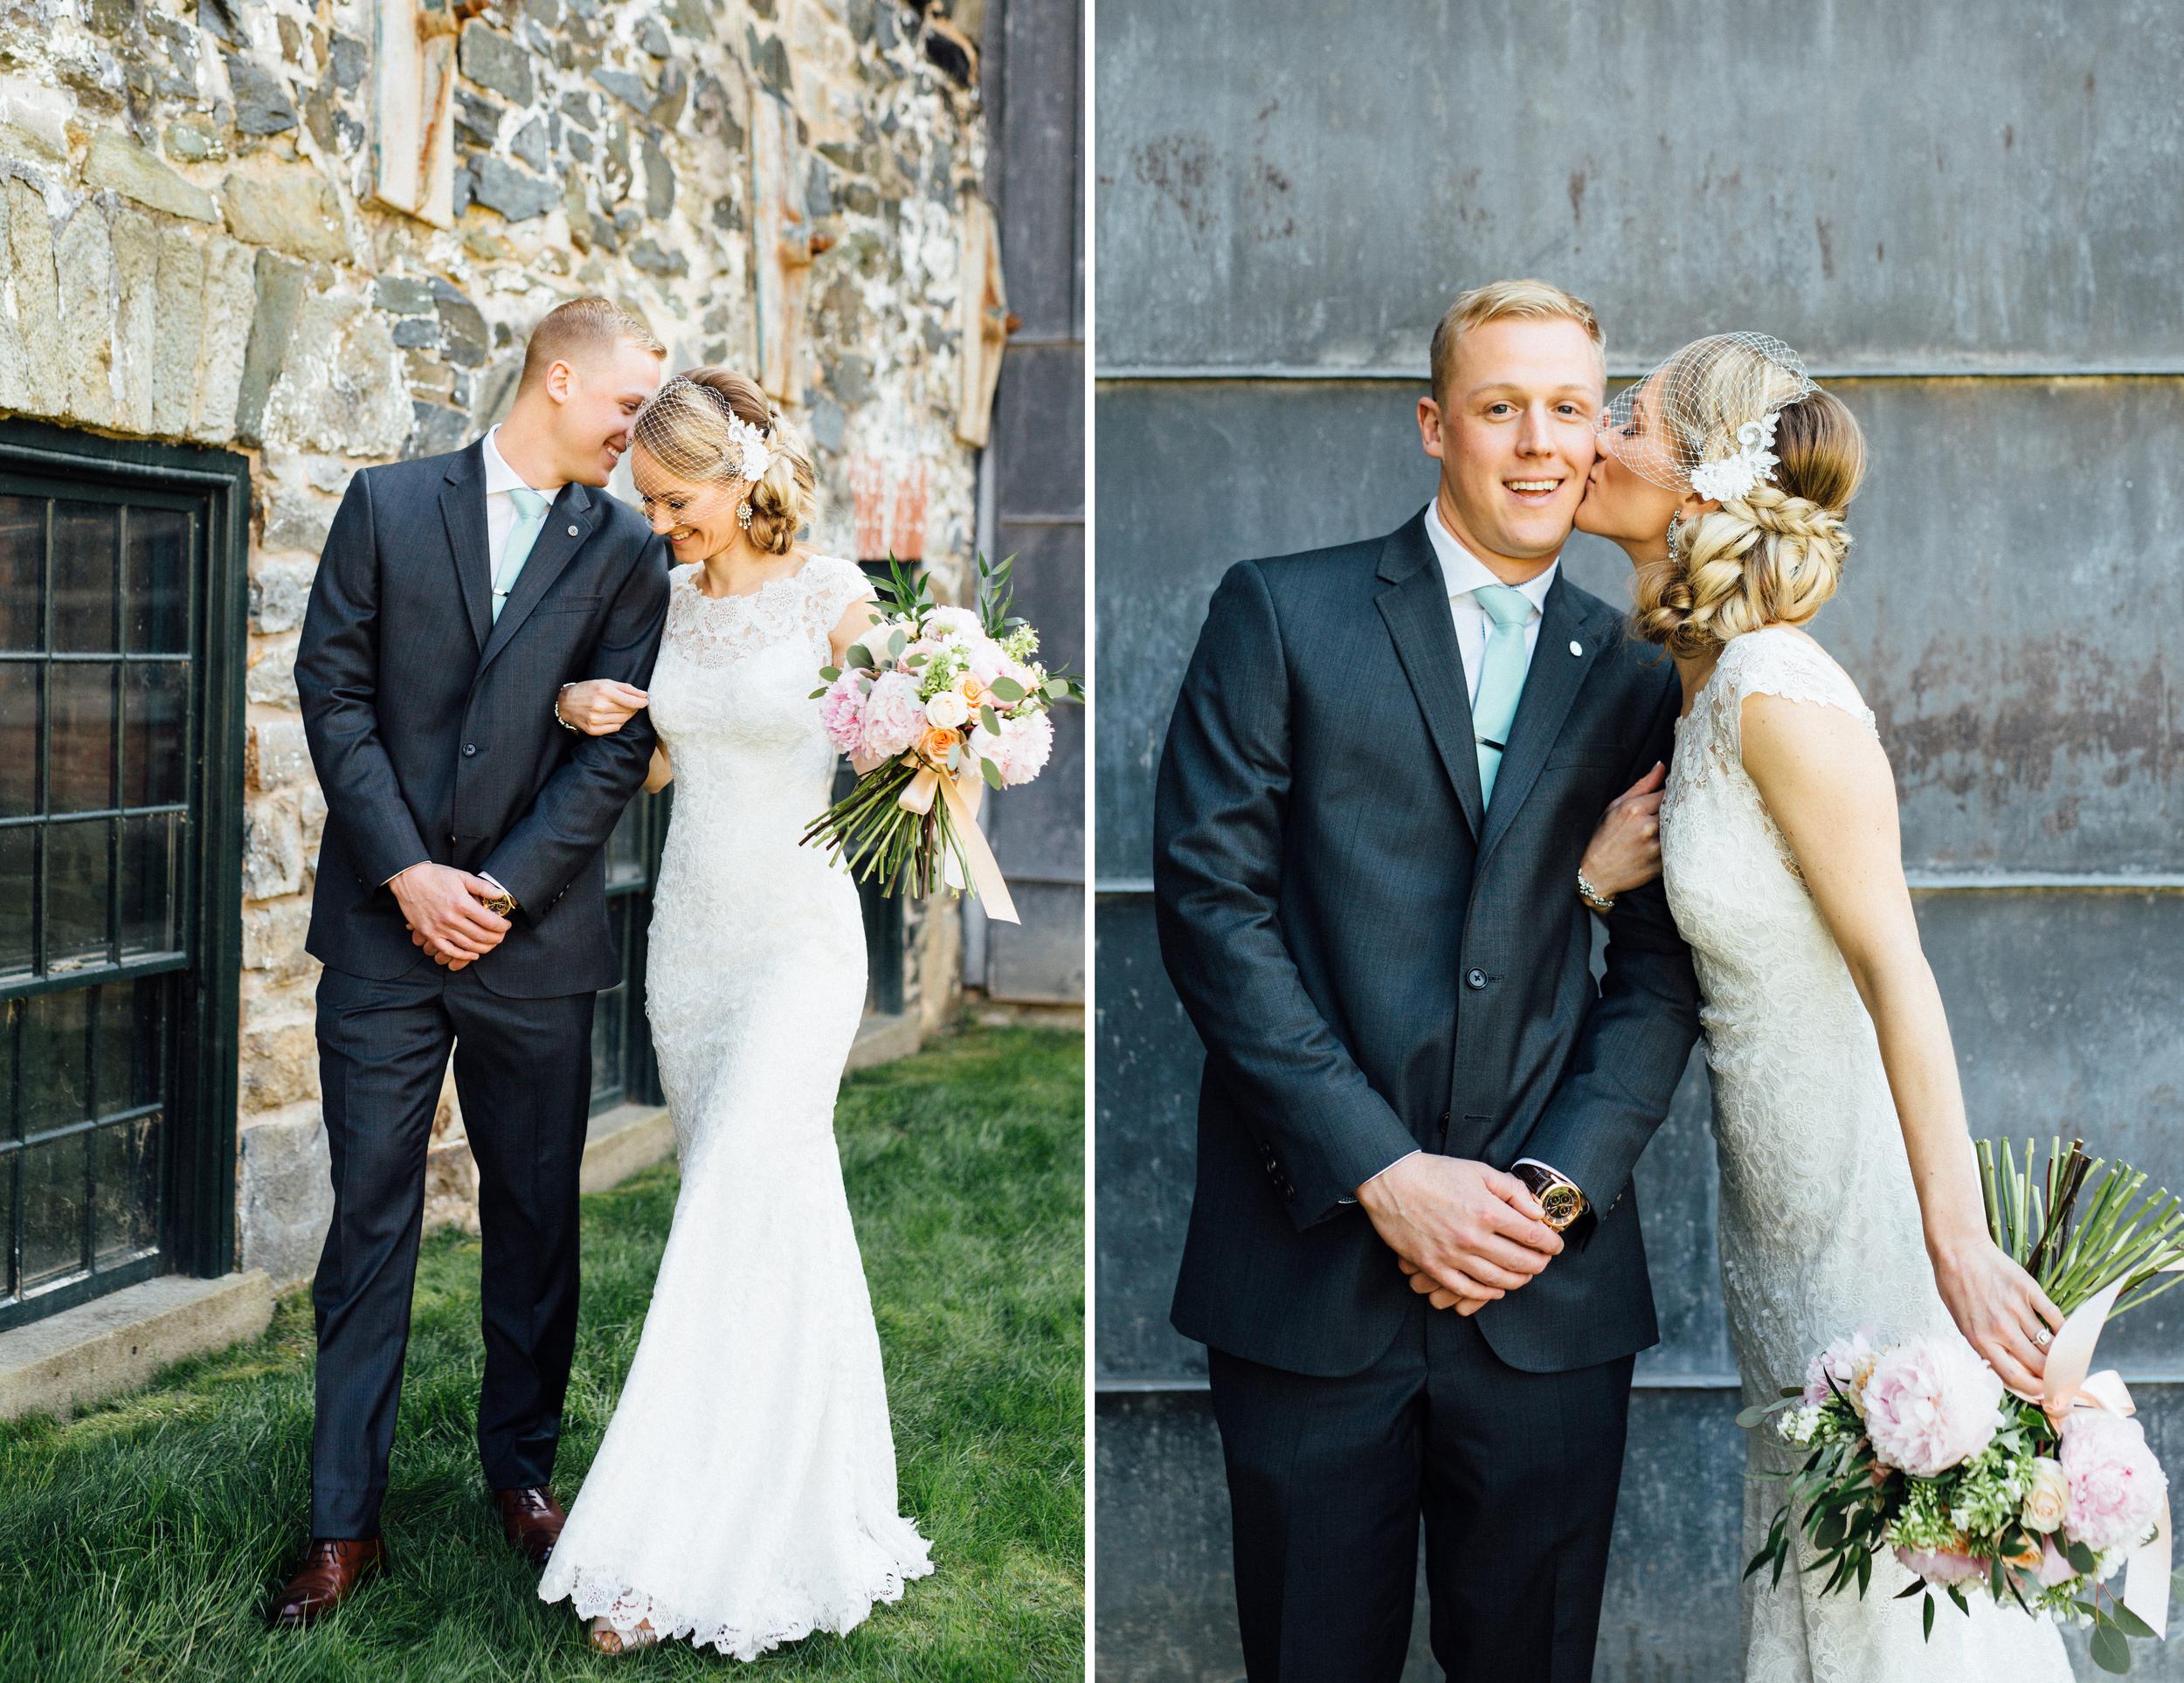 mt-washington-mill-dye-house-wedding-photography_maryland.jpg